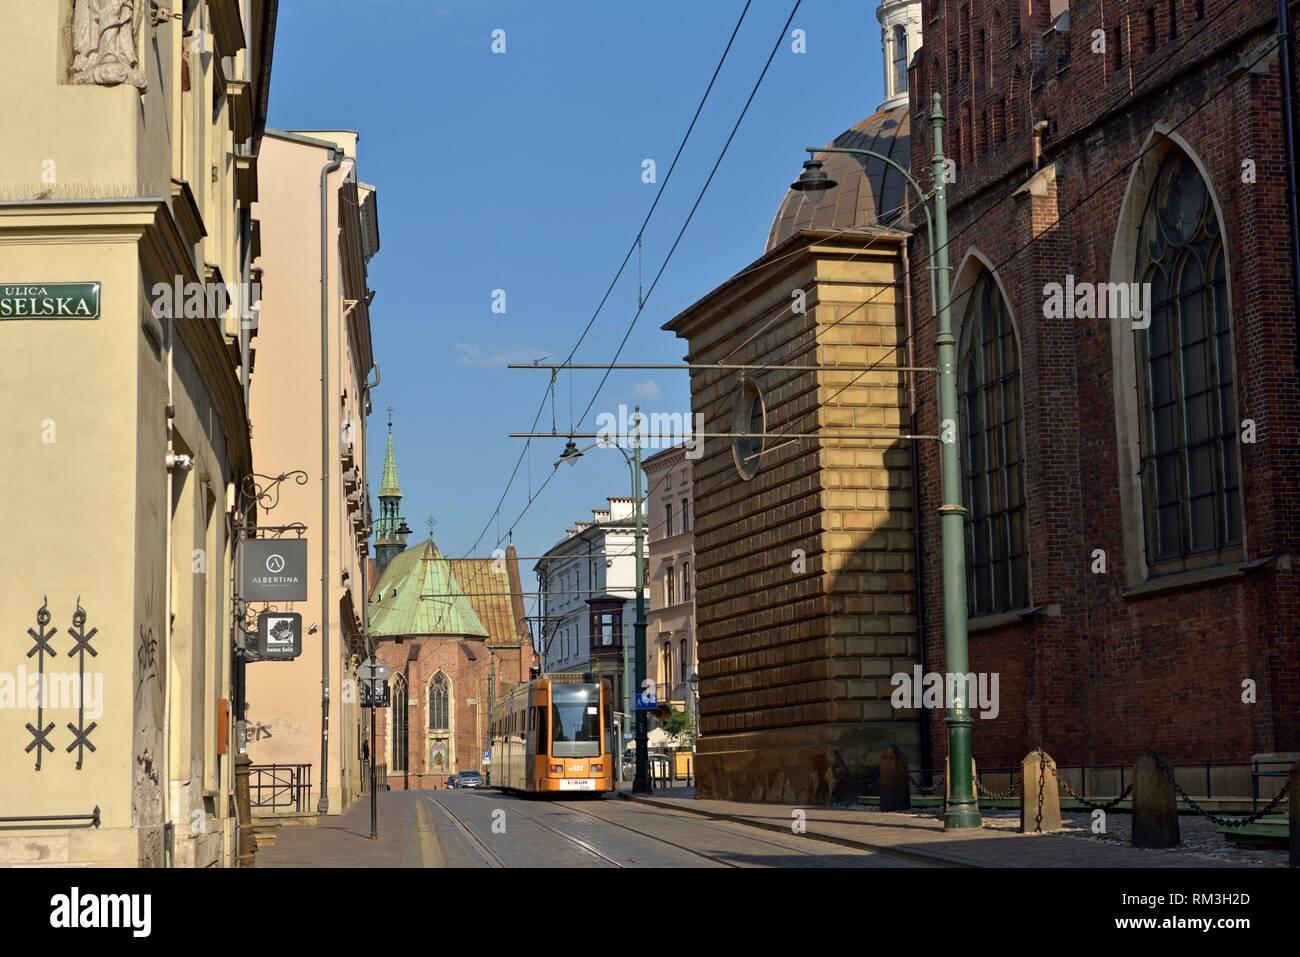 Krakow, Malopolska Province (Lesser Poland), Poland, Central Europe. - Stock Image